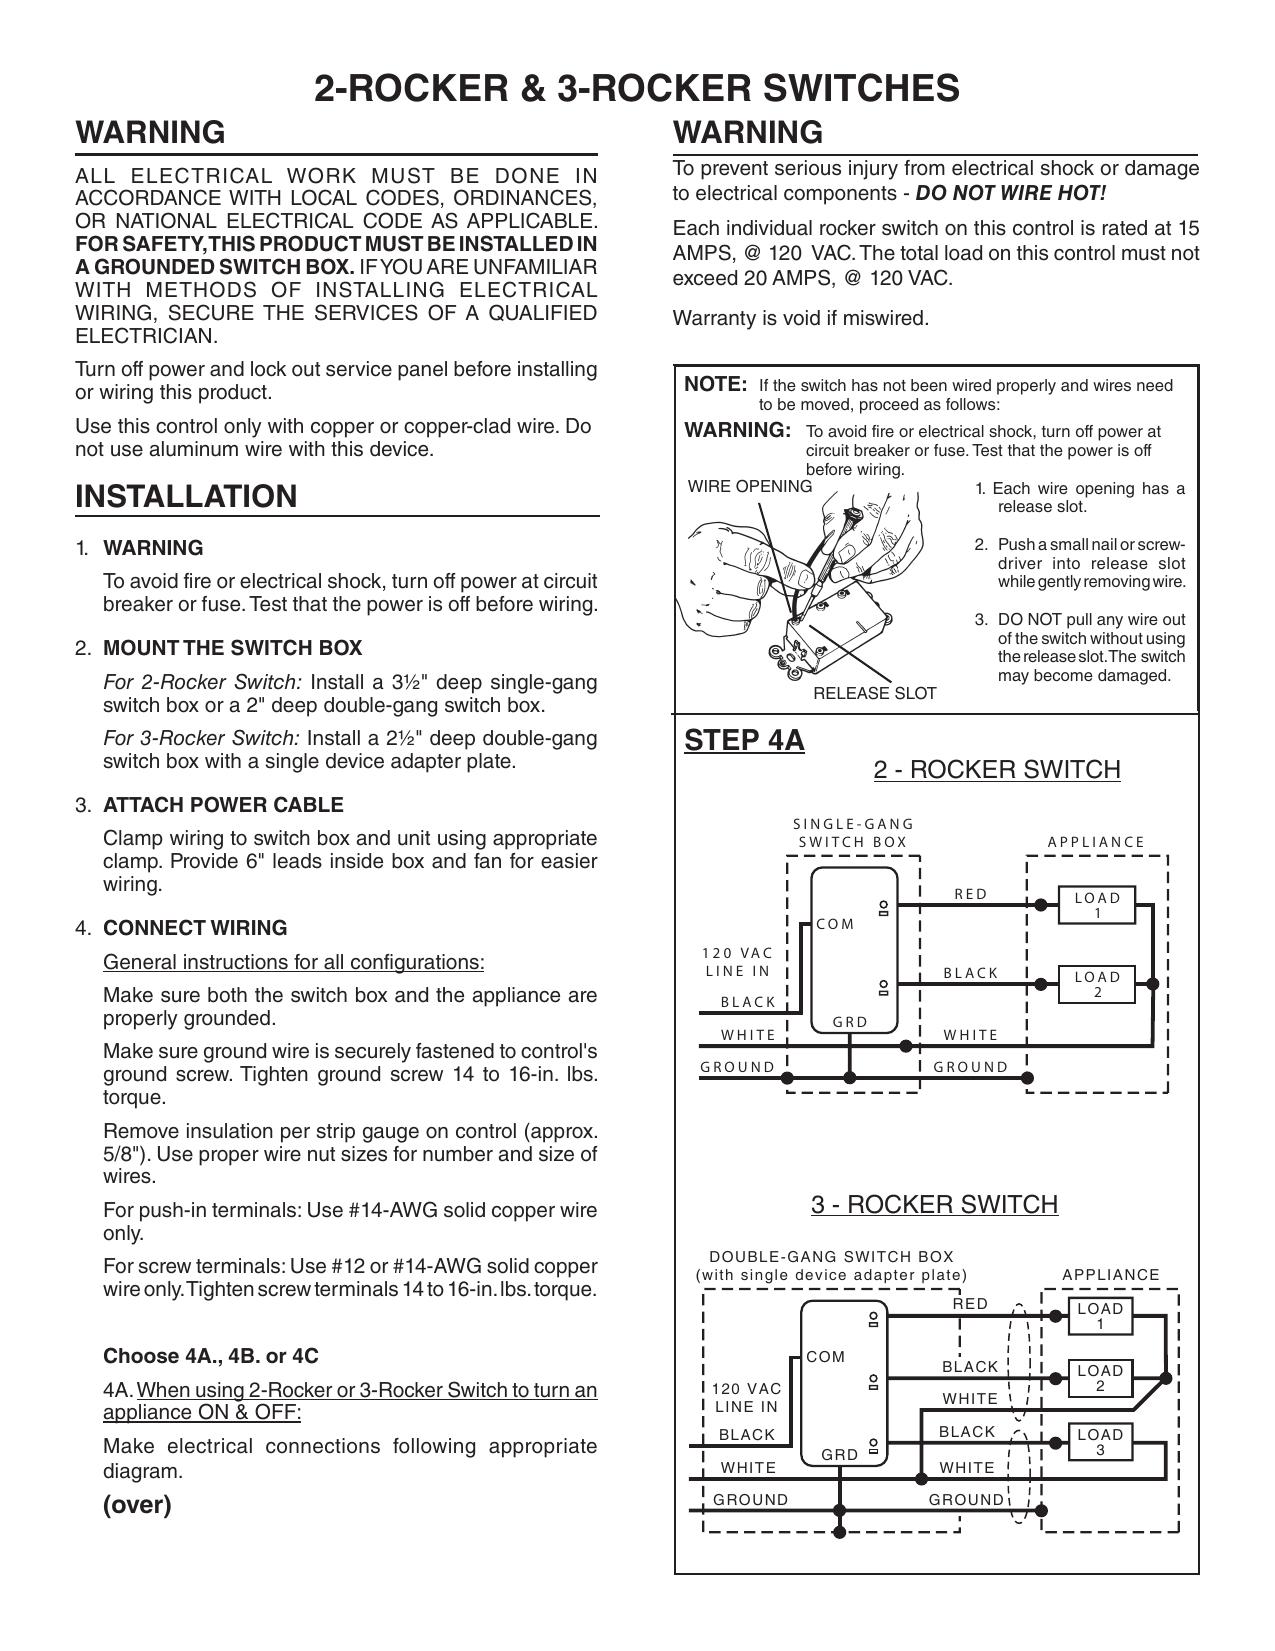 broan wiring diagram install guide wiring diagram section  broan wiring diagram install guide #5